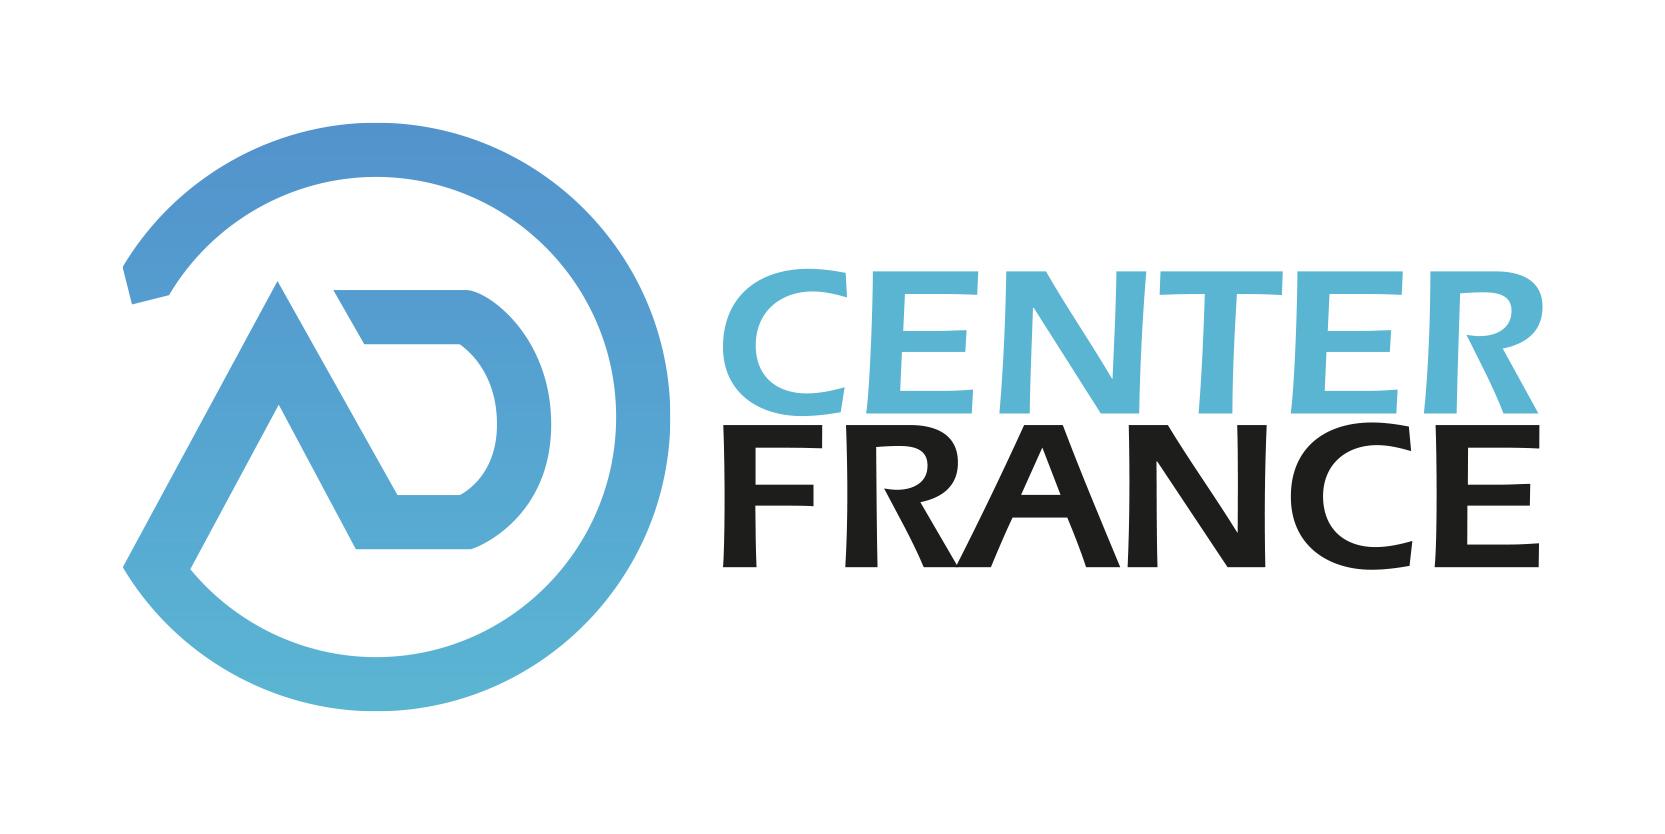 ADCenter France